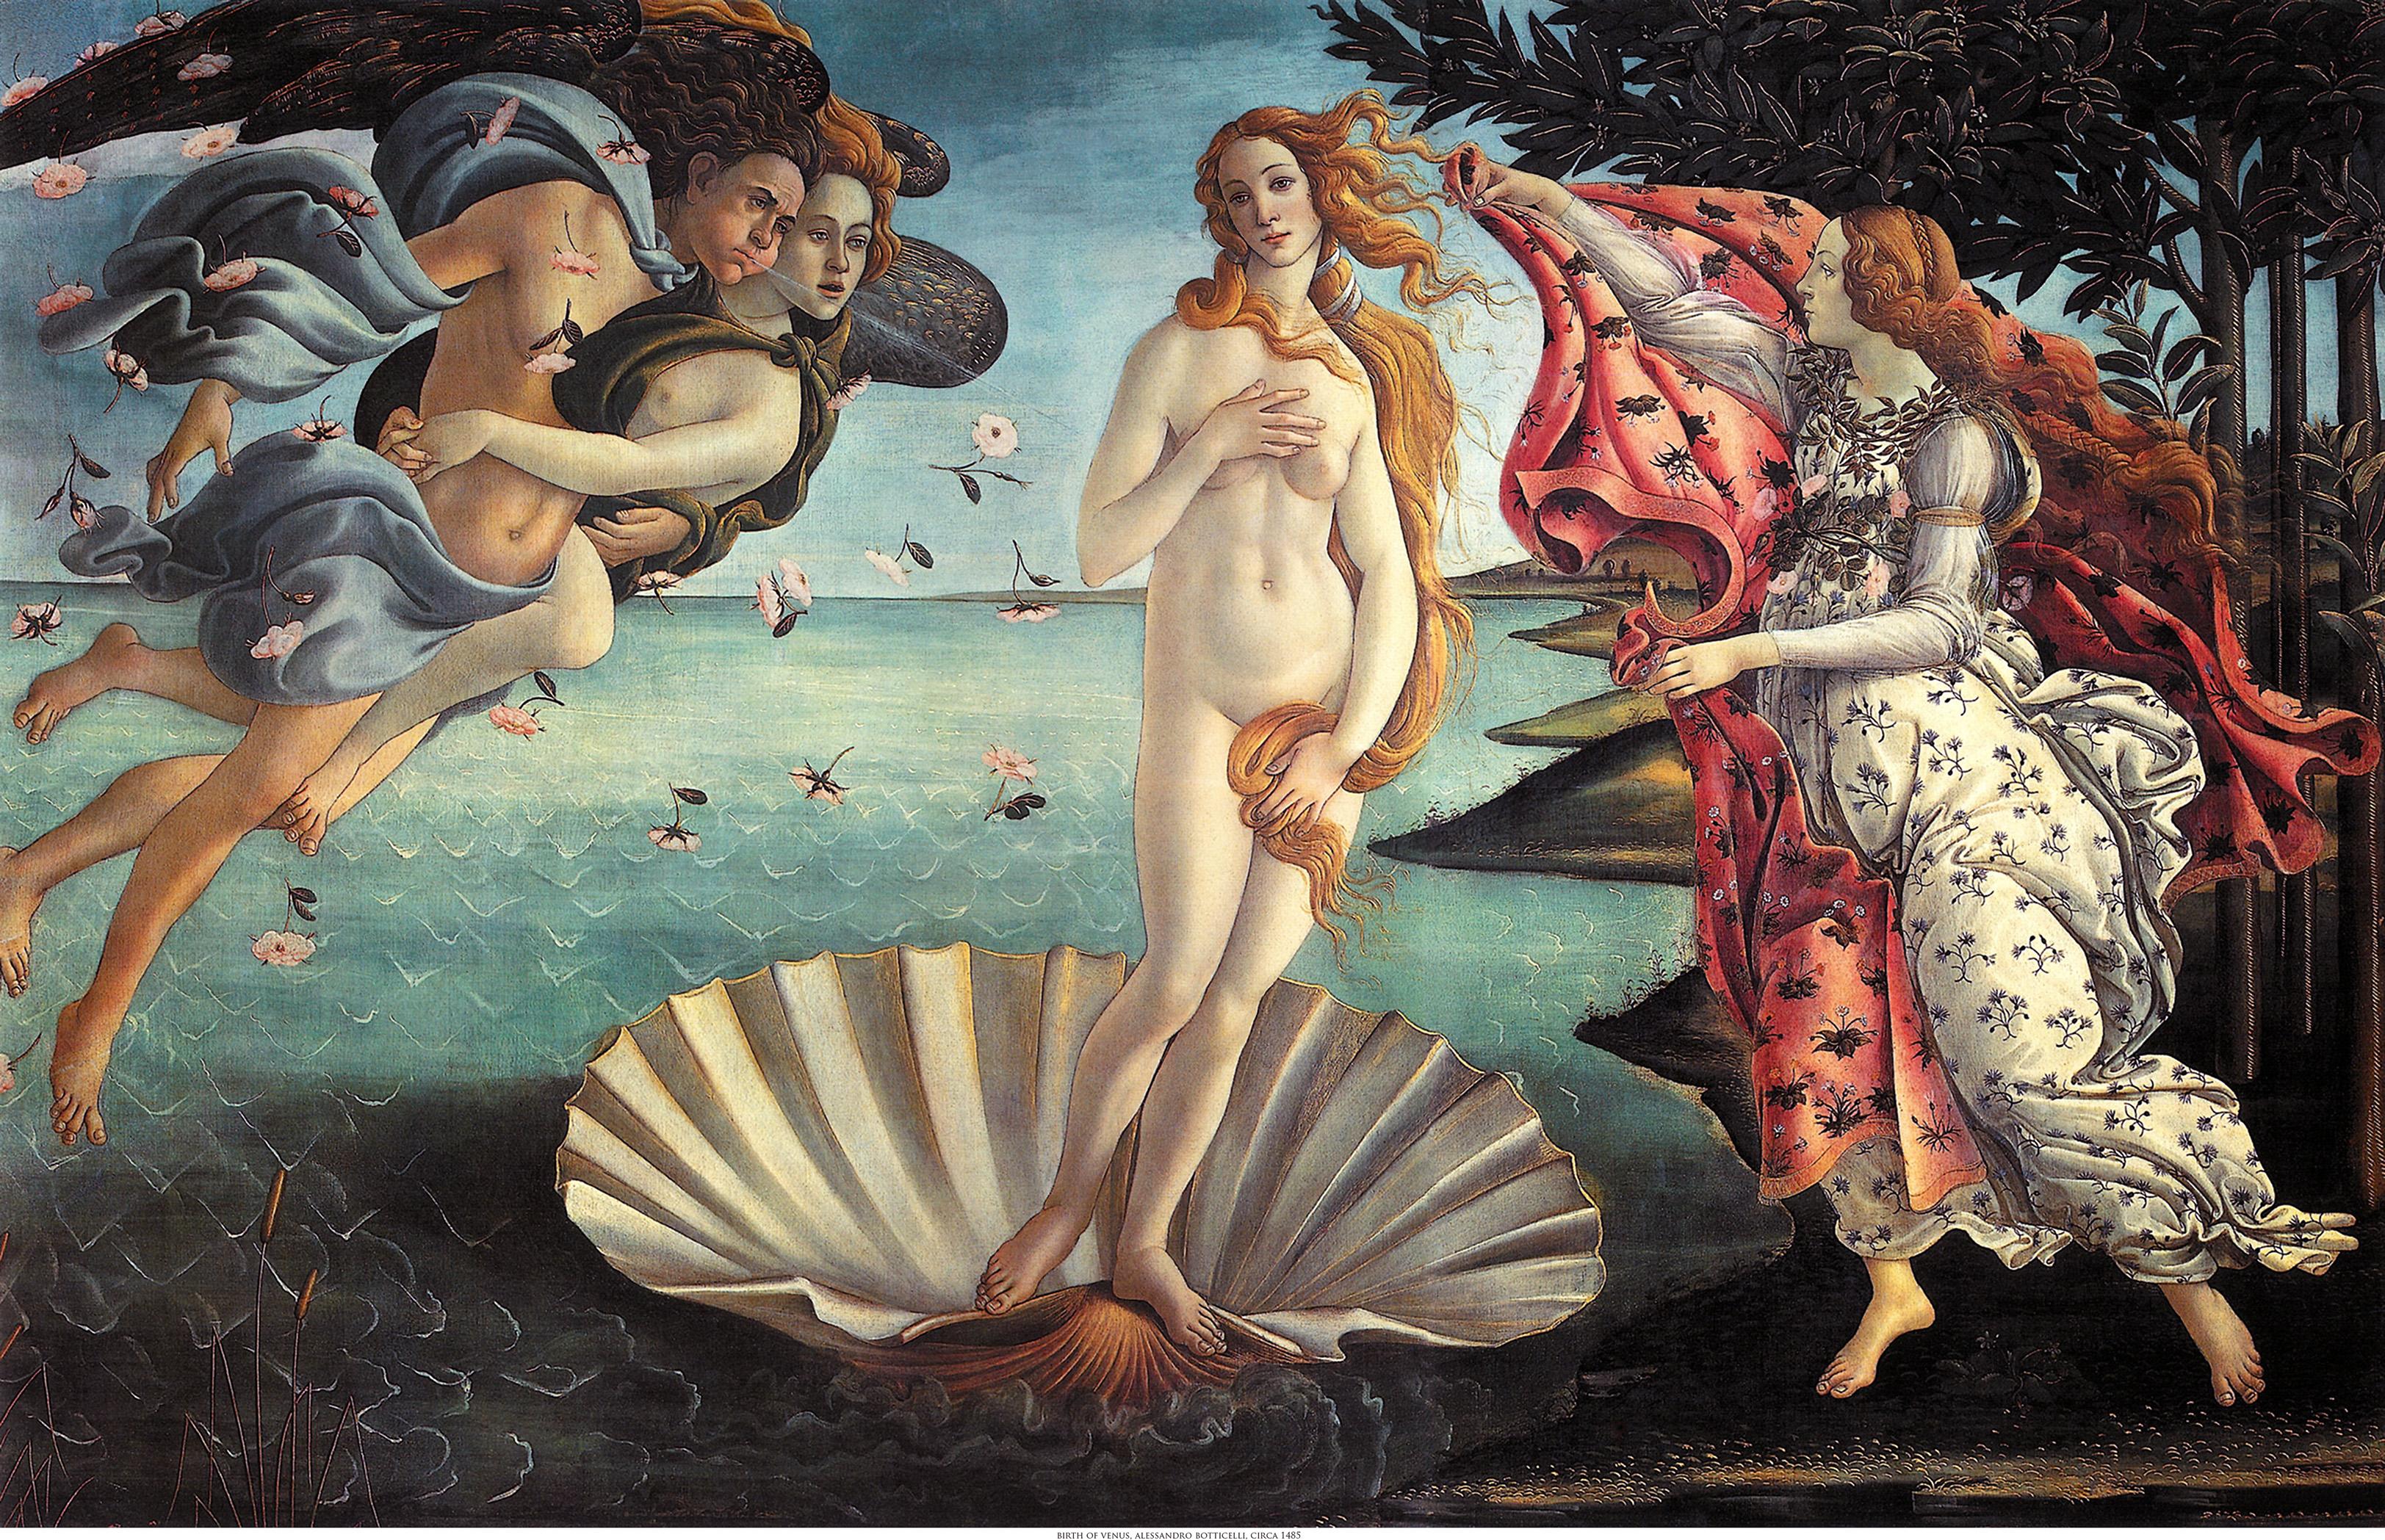 http://www.daystarvisions.com/Pix/Masters/Full/Birth_of_Venus-Sandro_Botticelli-circa_1485-DCedit.jpg